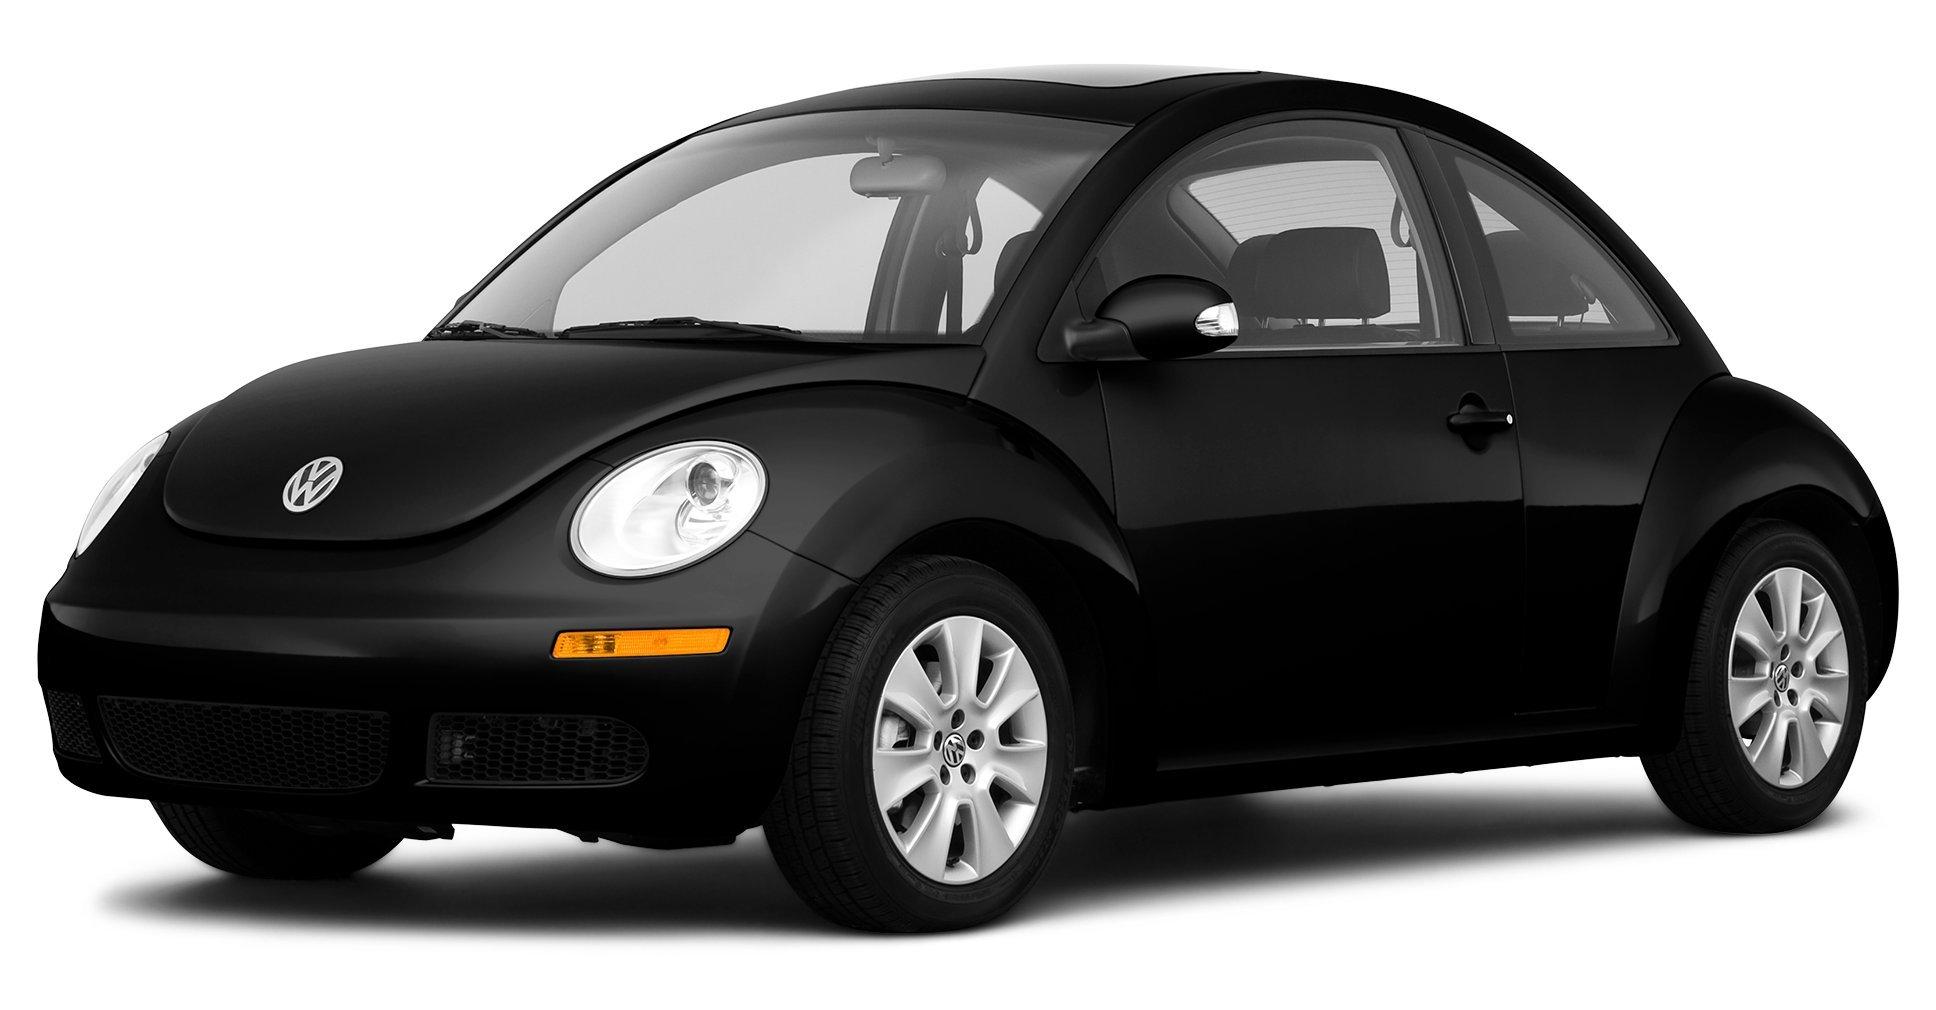 Amazon com: 2010 Volkswagen Beetle Reviews, Images, and Specs: Vehicles